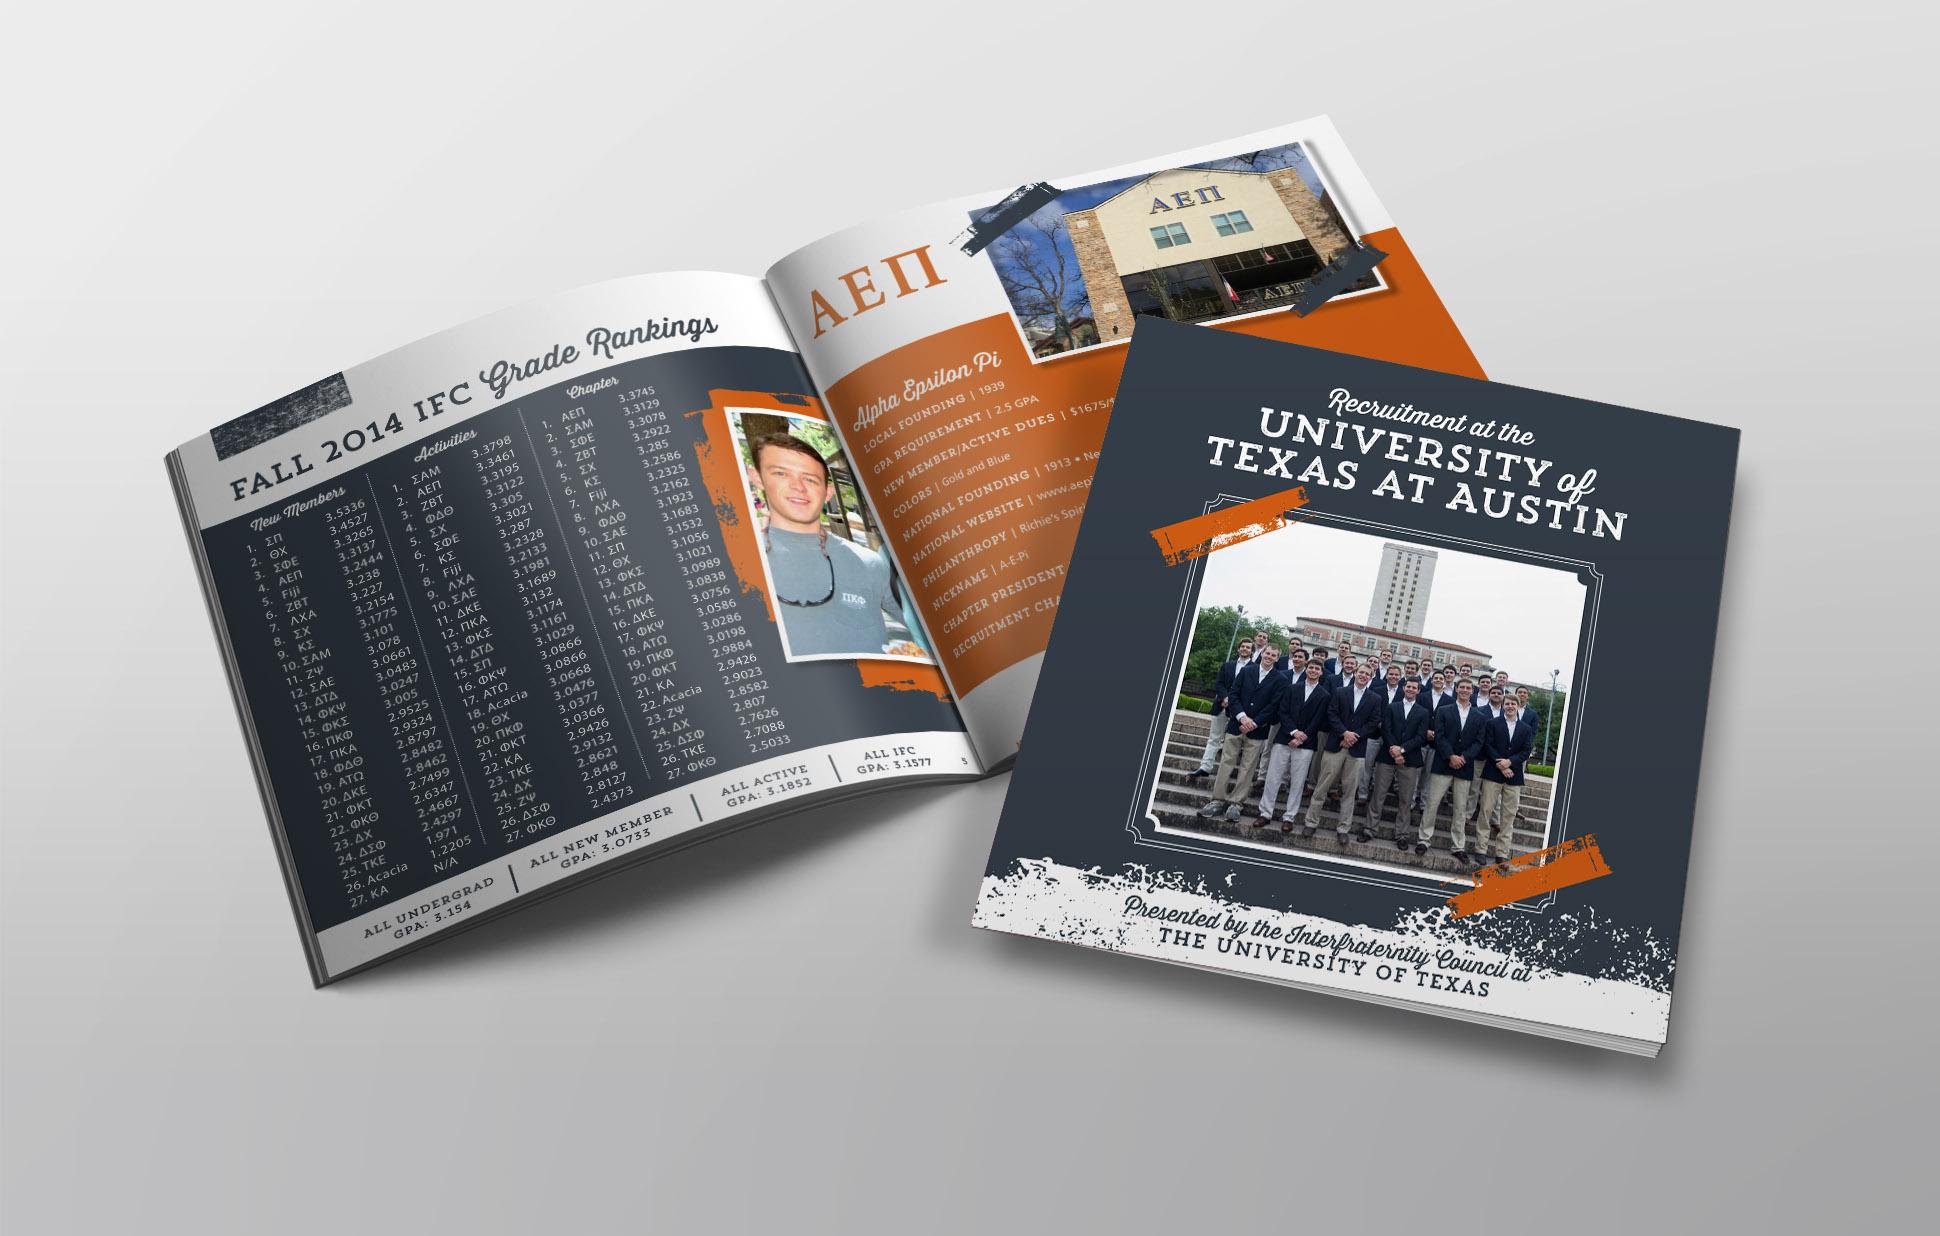 UniversityofAustinTexas_IFC.jpg